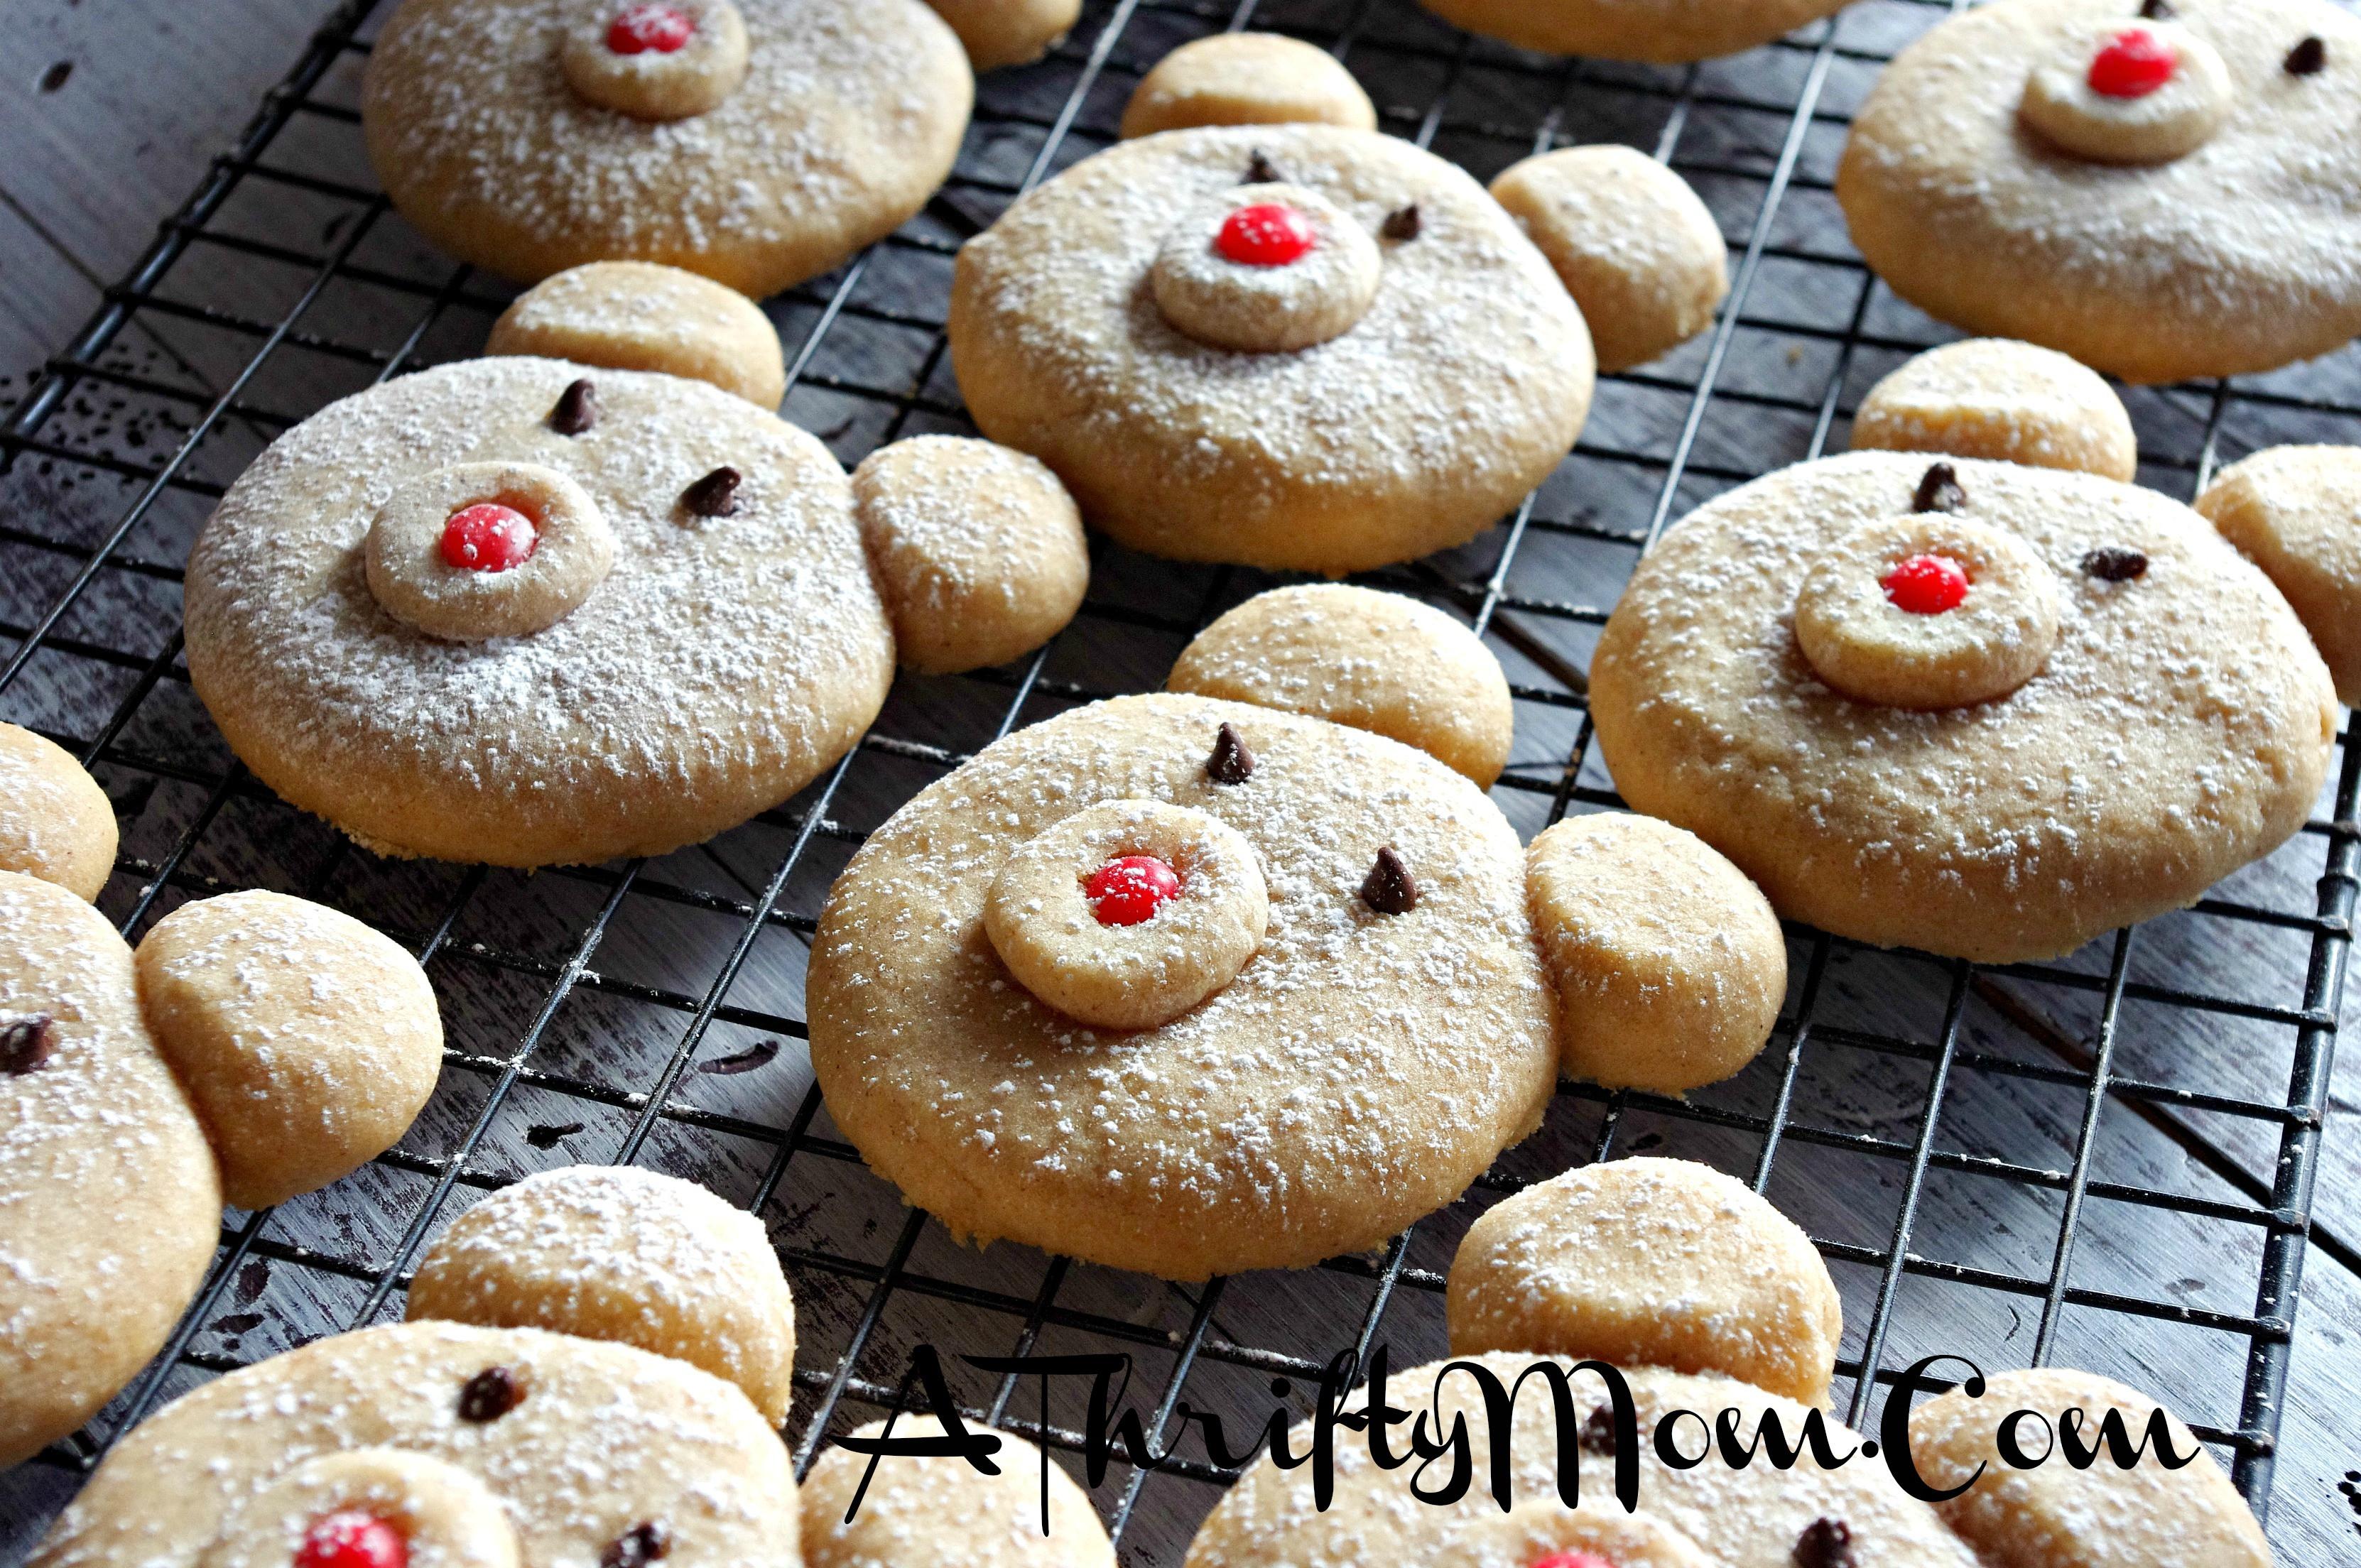 Cute Christmas Cookies Recipes  Christmas Cookies Cute Christmas Cookies How To Make